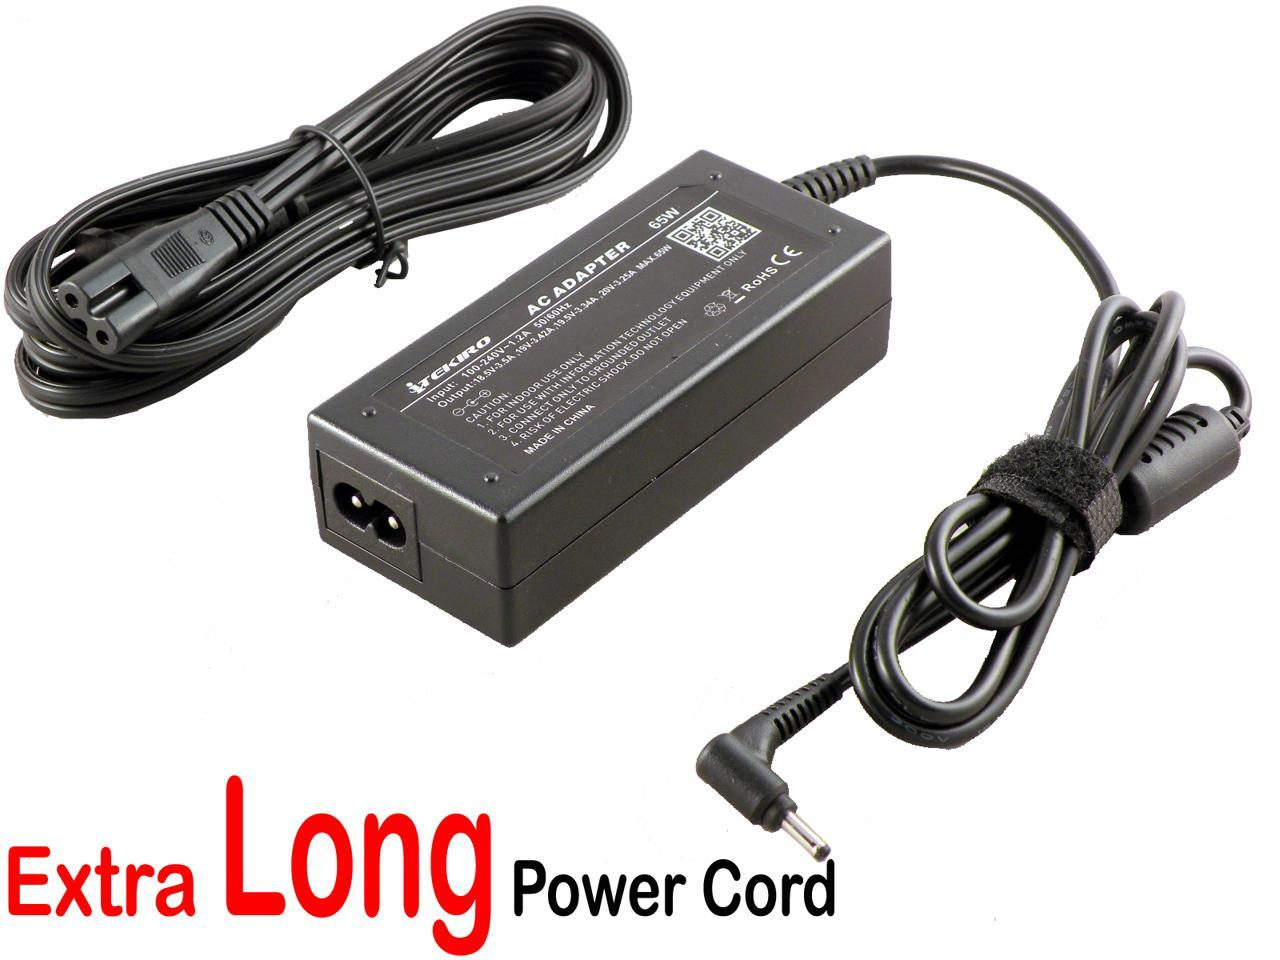 iTEKIRO 19V AC Adapter for Samsung NP940X3G NP940X3K NP940X3L NP940X3M NP940X3N NP940X5J NP940X5N XE700T1A; Samsung A13-040N2A AA-PA2N40L AA-PA2N40S AA-PA3NS40//US AD-4019A AD-4019P AD-4019W AD-4019SL